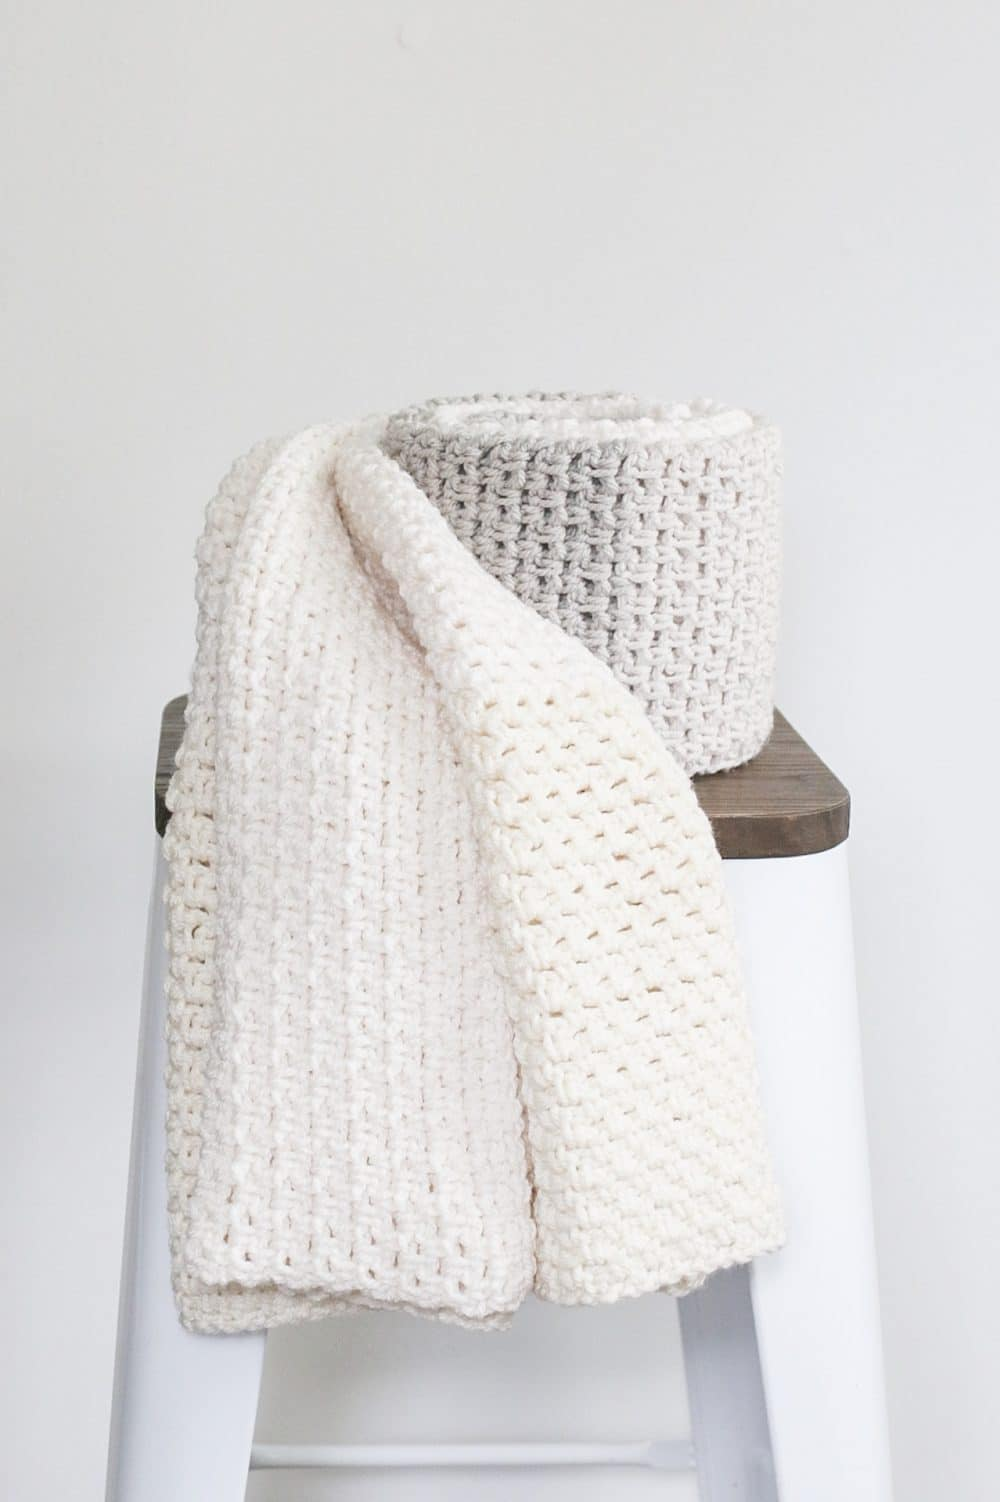 Neutral Color Block Crochet Blanket Pattern - The Sweeter